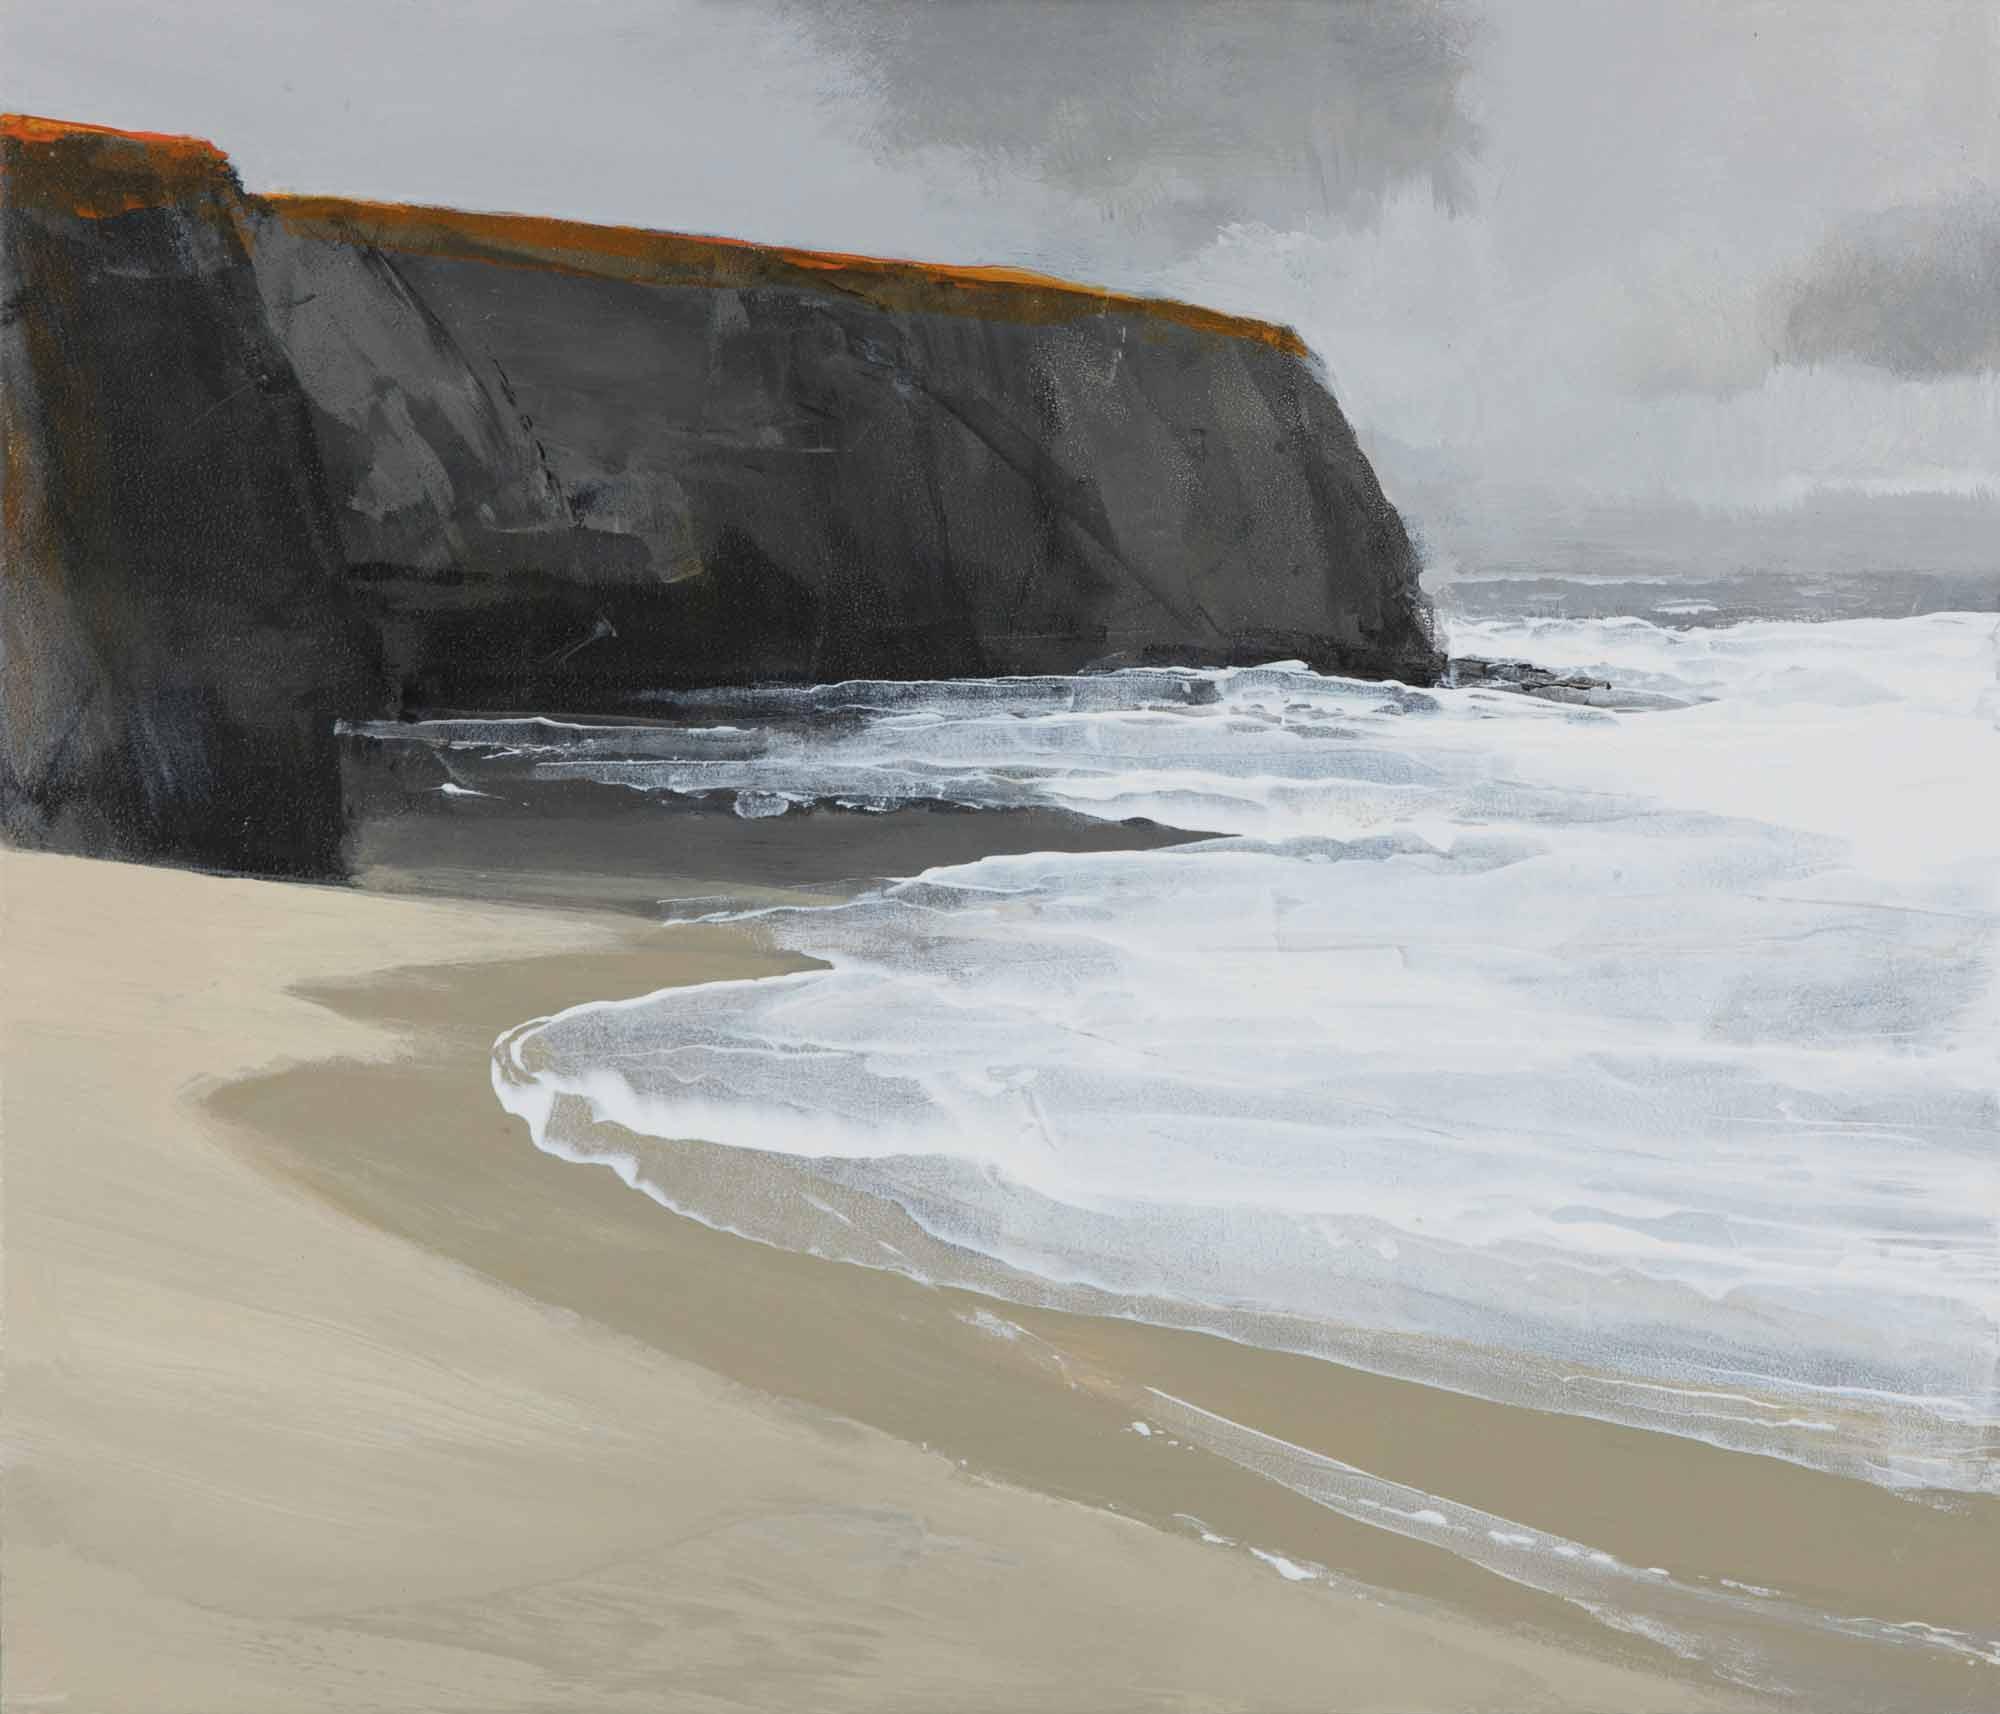 http://neilcanning.com/wp-content/uploads/sites/3/2017/03/16-Northcoast-Sand.jpg